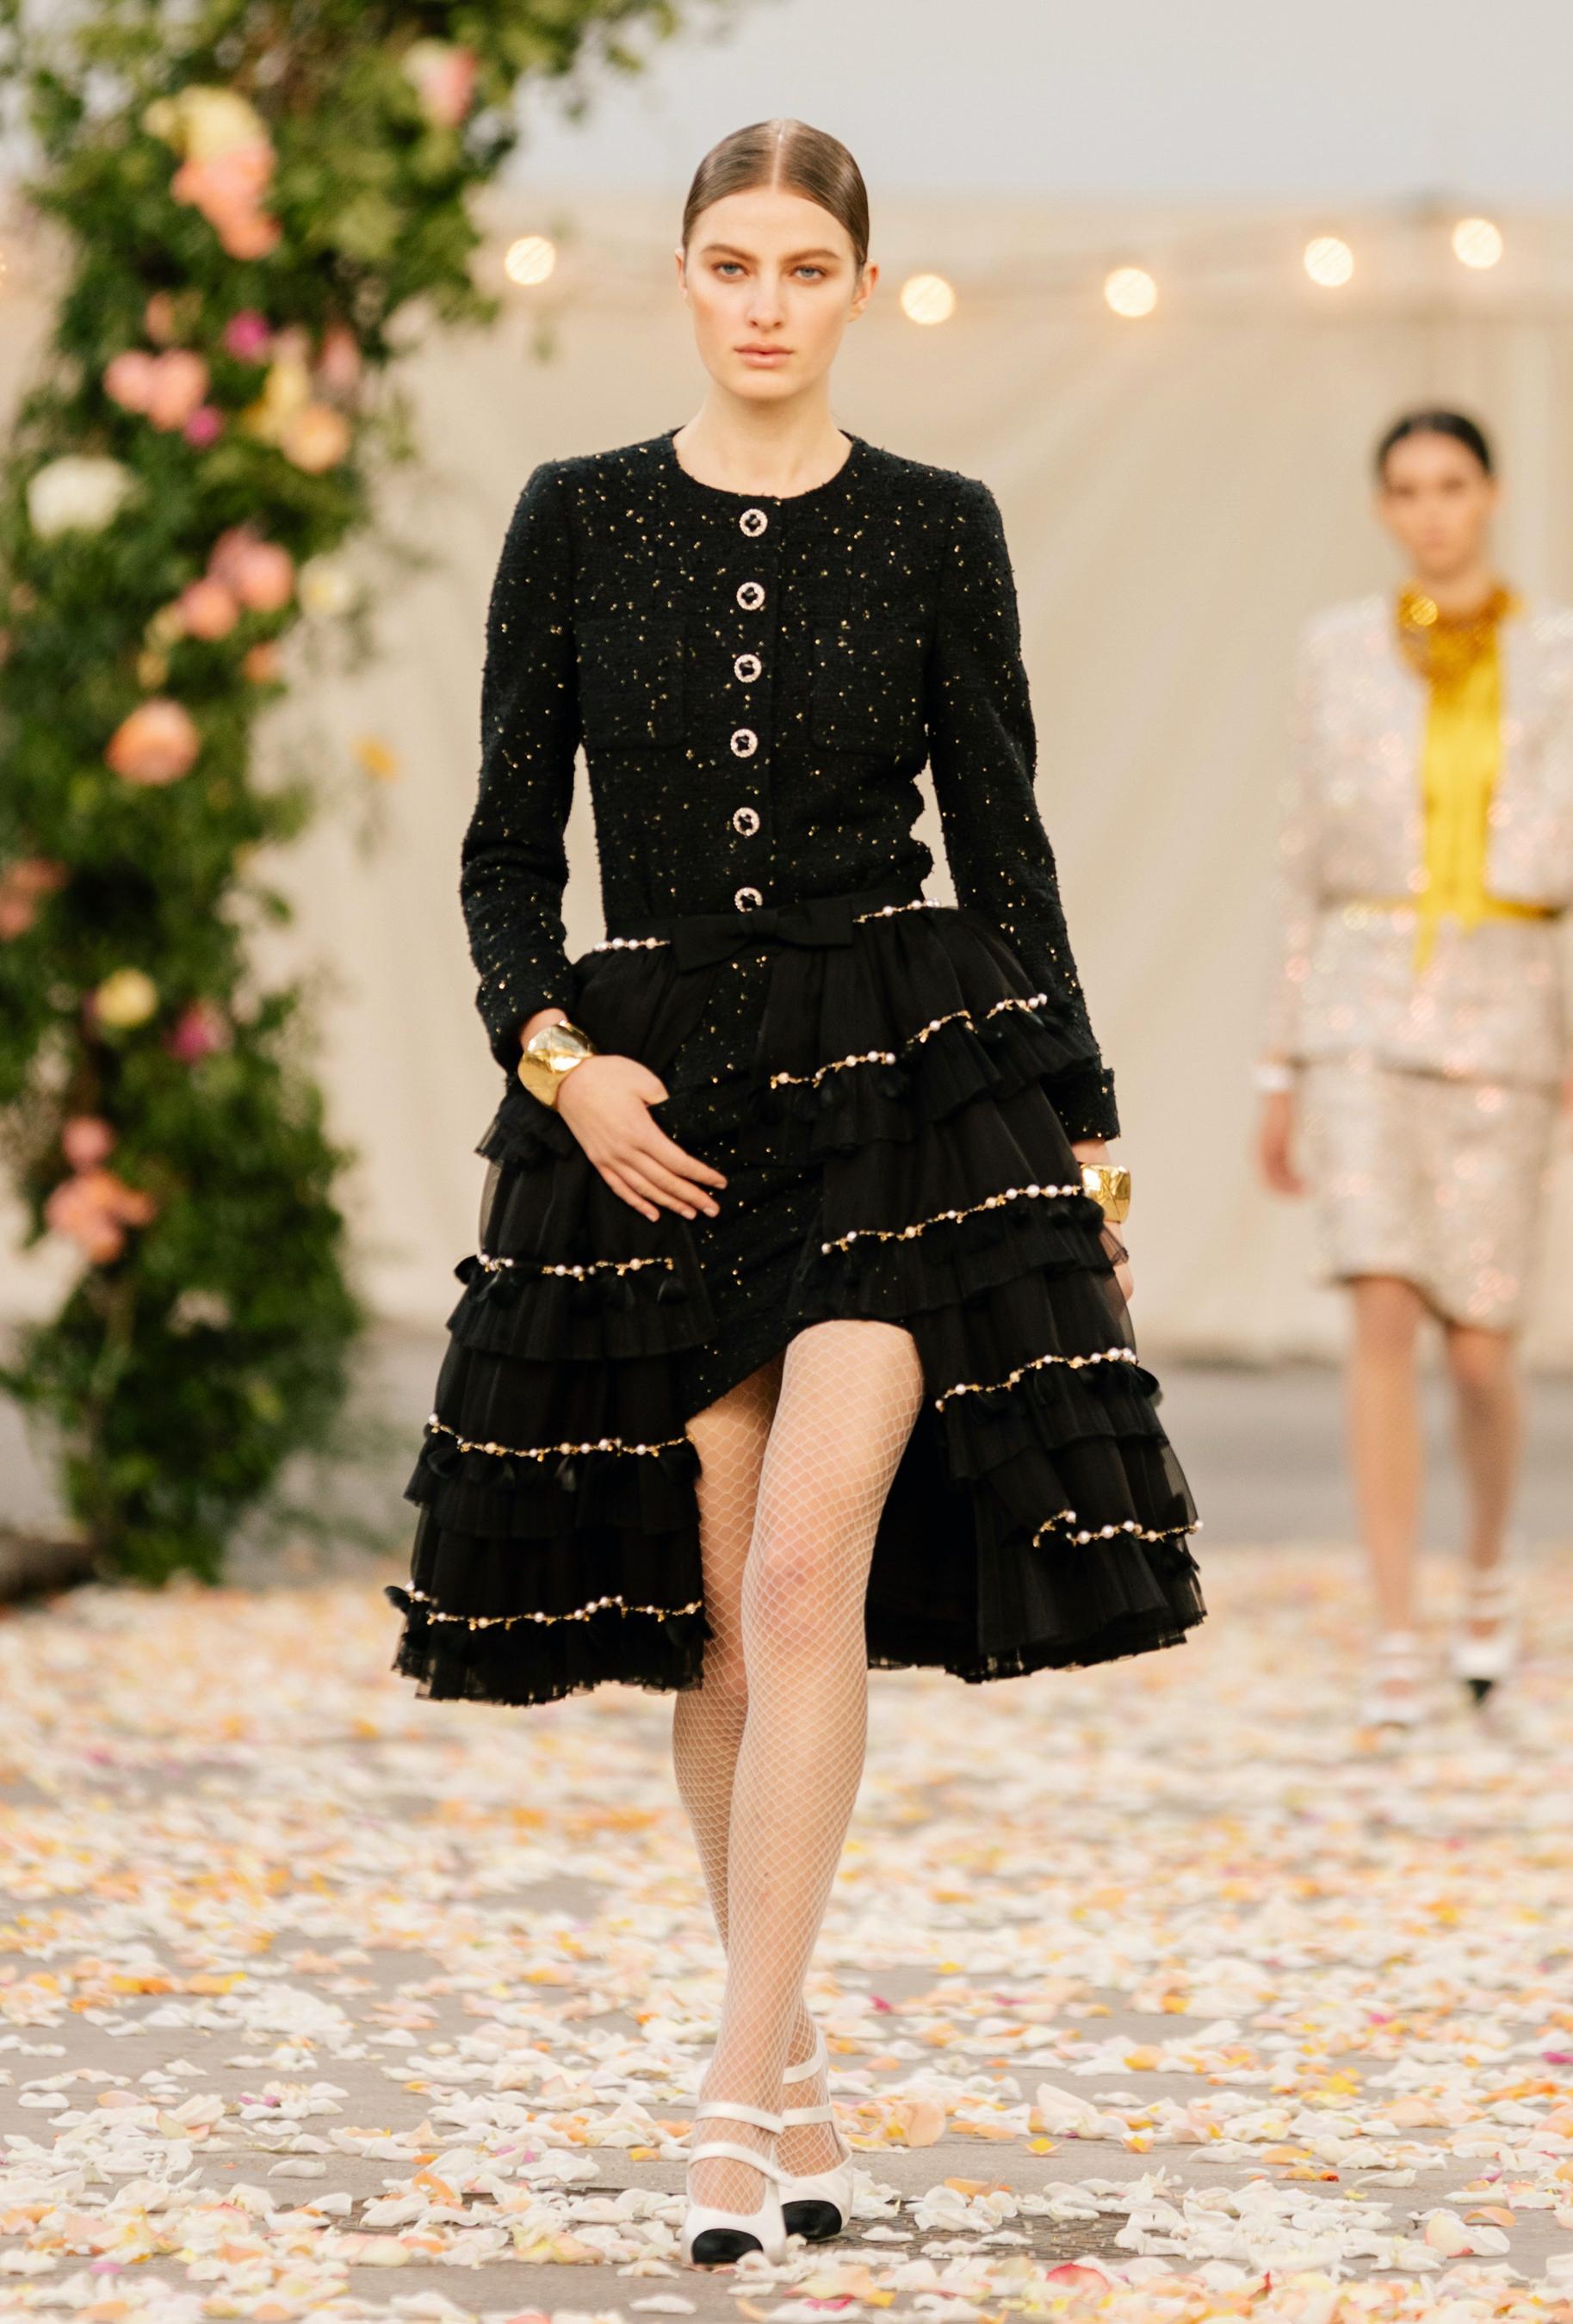 Chanel Spring 2021 Couture Fashion Show Photos